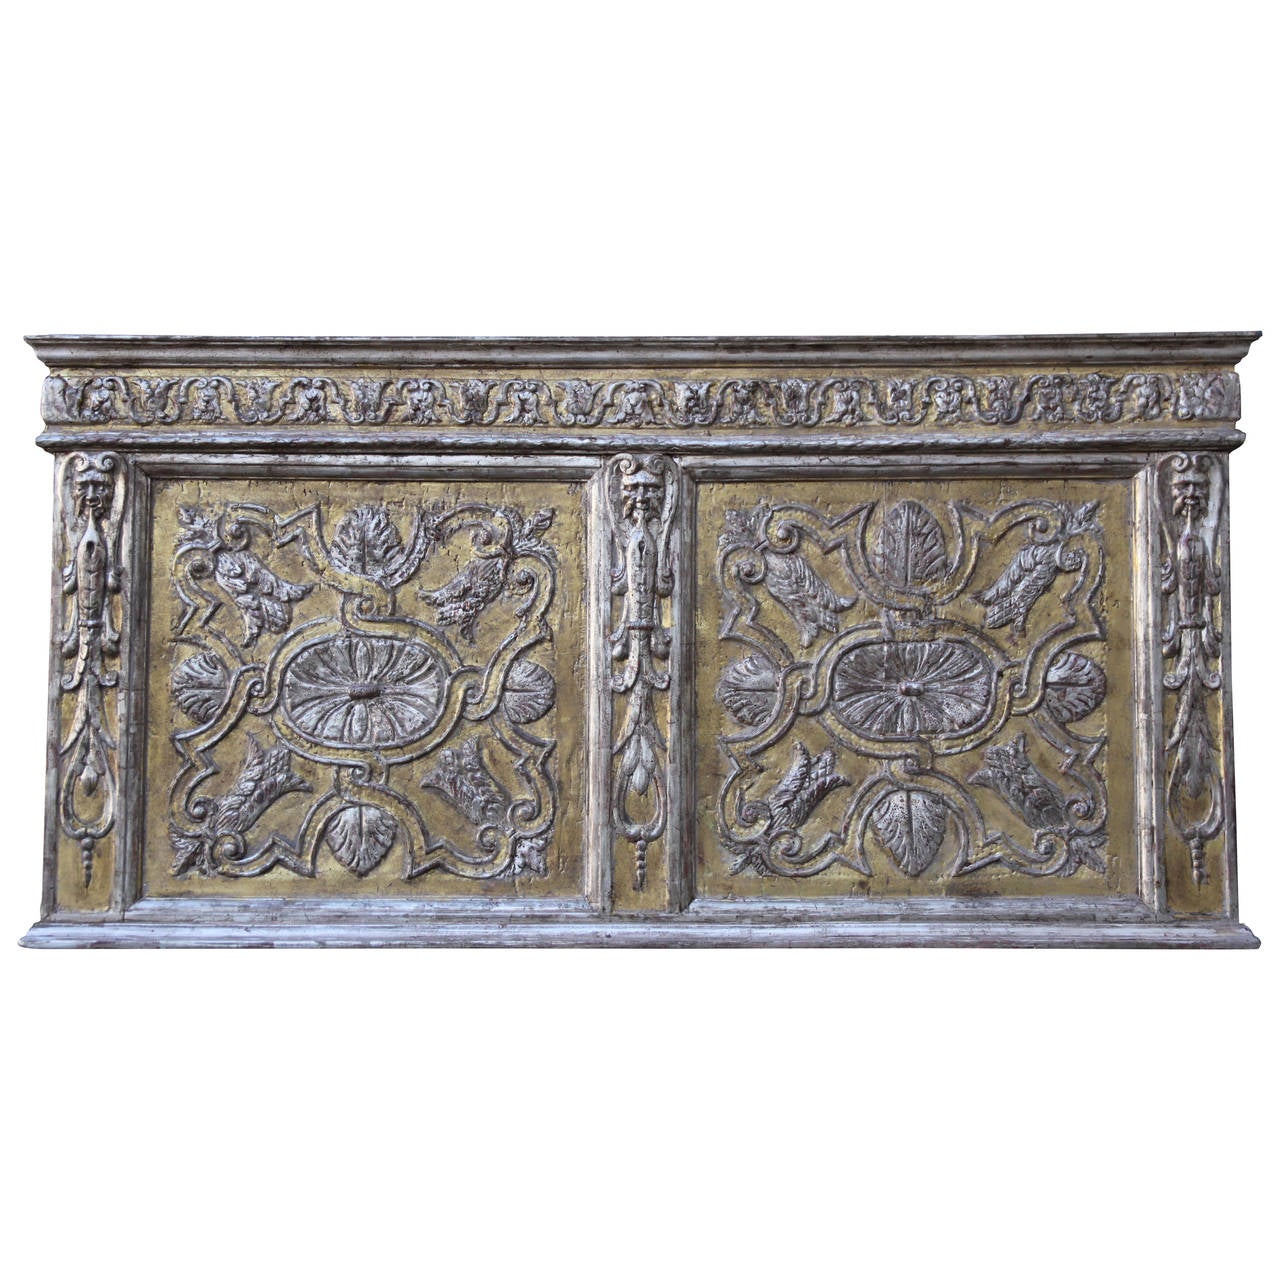 19th Century Carved Italian Panel